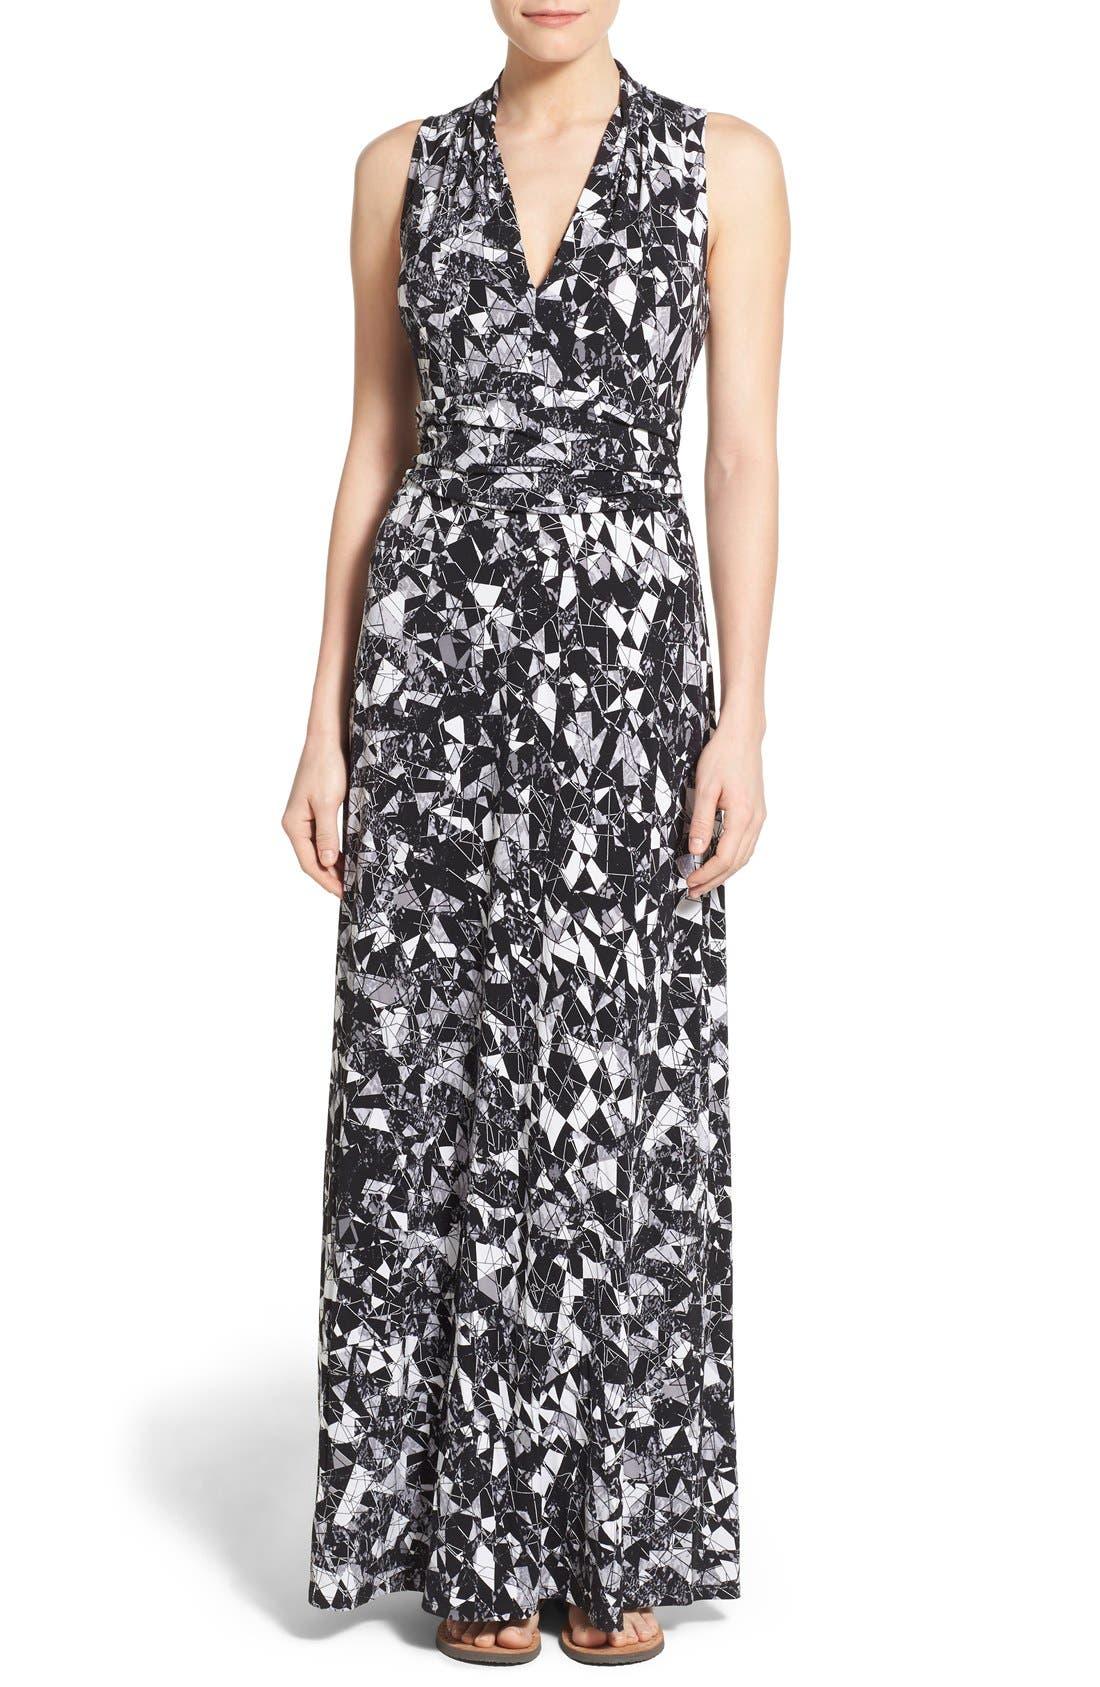 Alternate Image 1 Selected - Vince Camuto Print Jersey Cutaway Shoulder Maxi Dress (Petite)